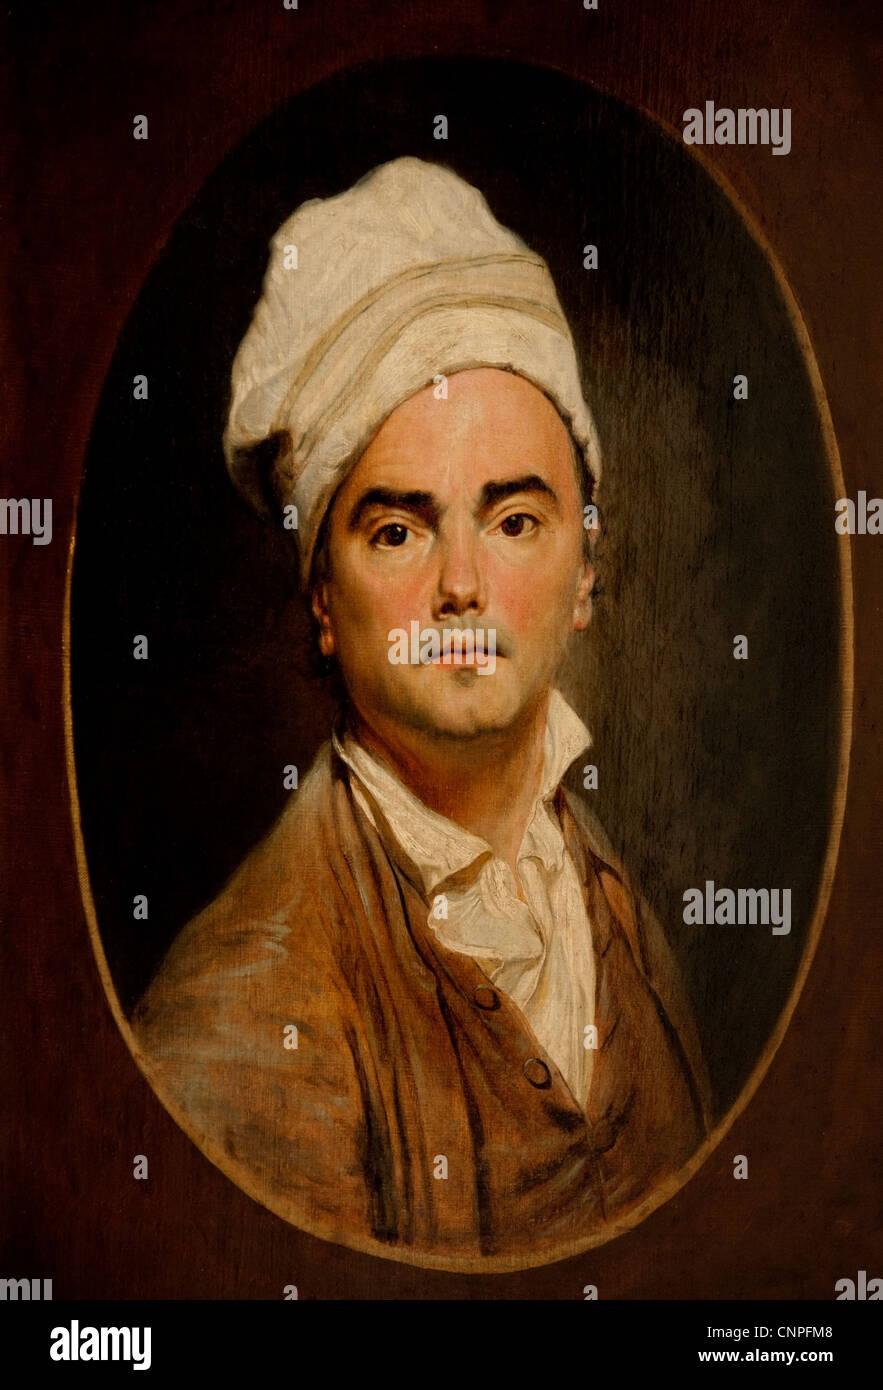 self portrait  1799 Jean Antoine Julien - Julien de PARMA 1736-1738 Swiss Switzerland - Stock Image